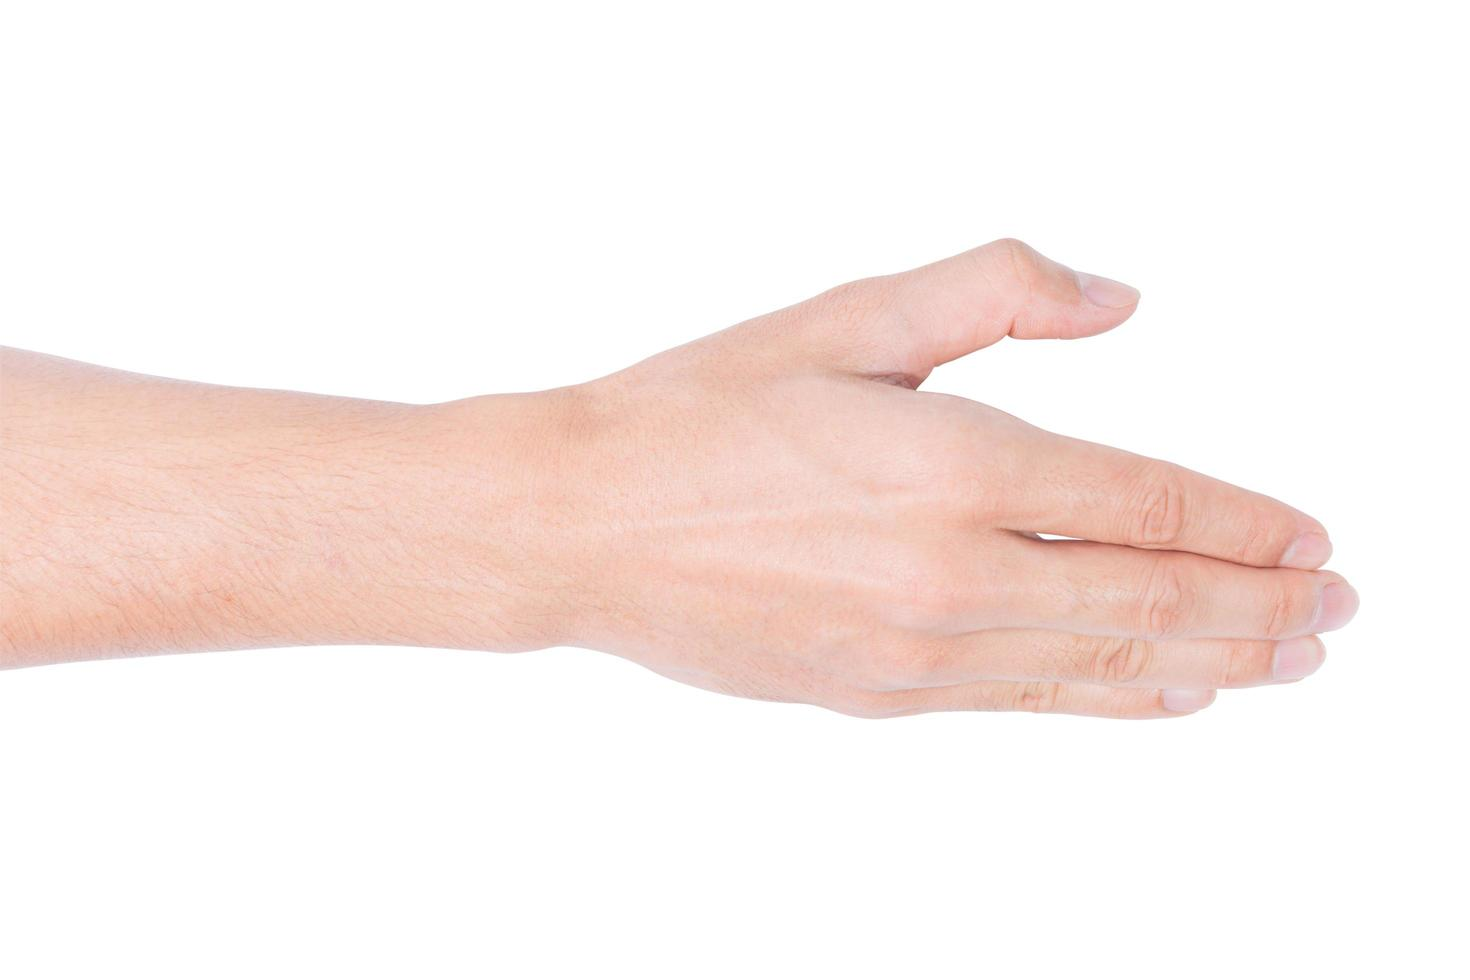 mano sobre fondo blanco foto